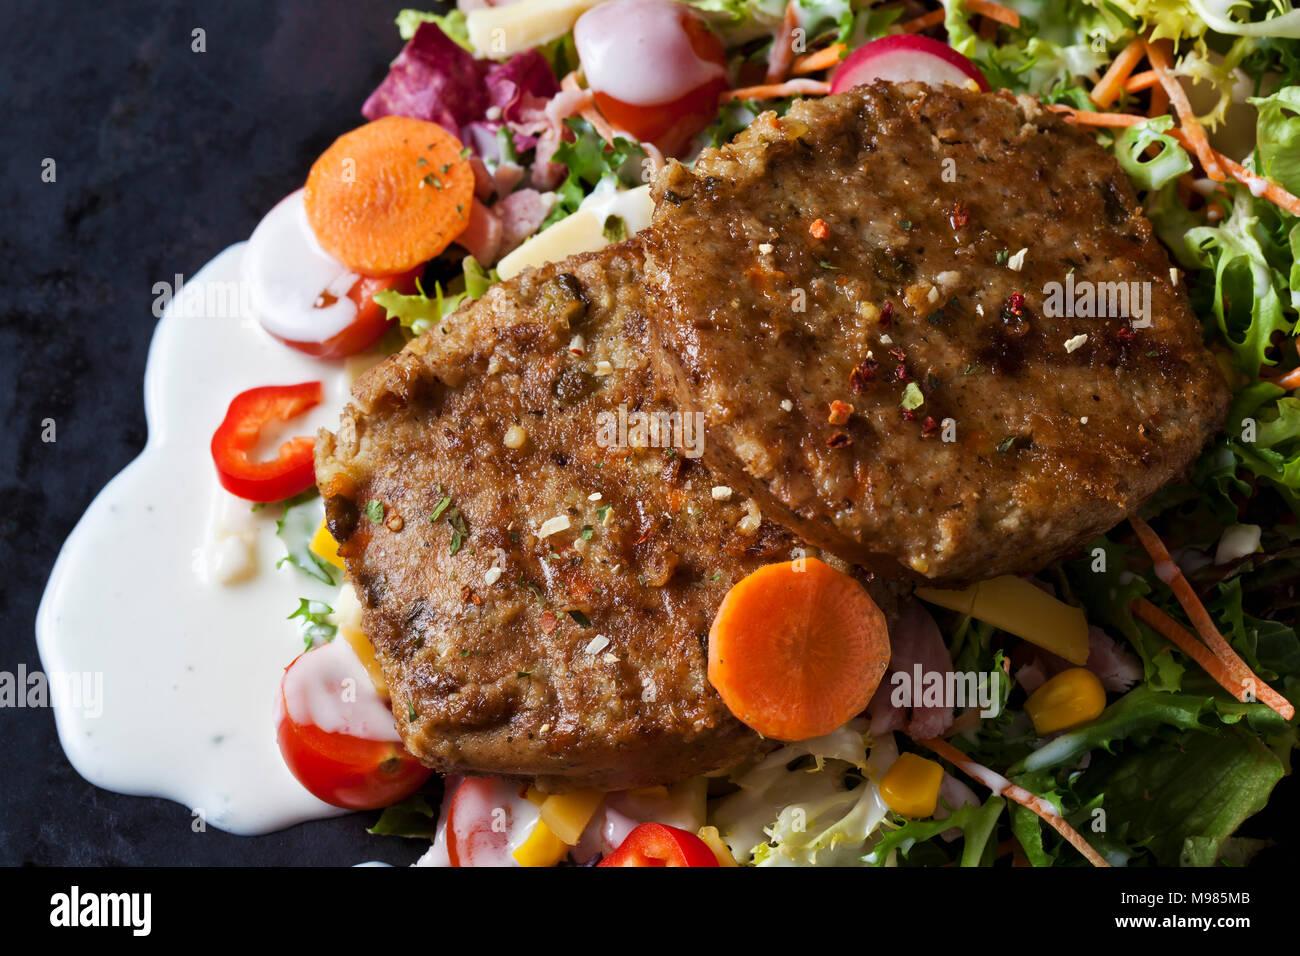 Veggie Burger mit Salat, Gemüse und Joghurt Sauce Stockbild